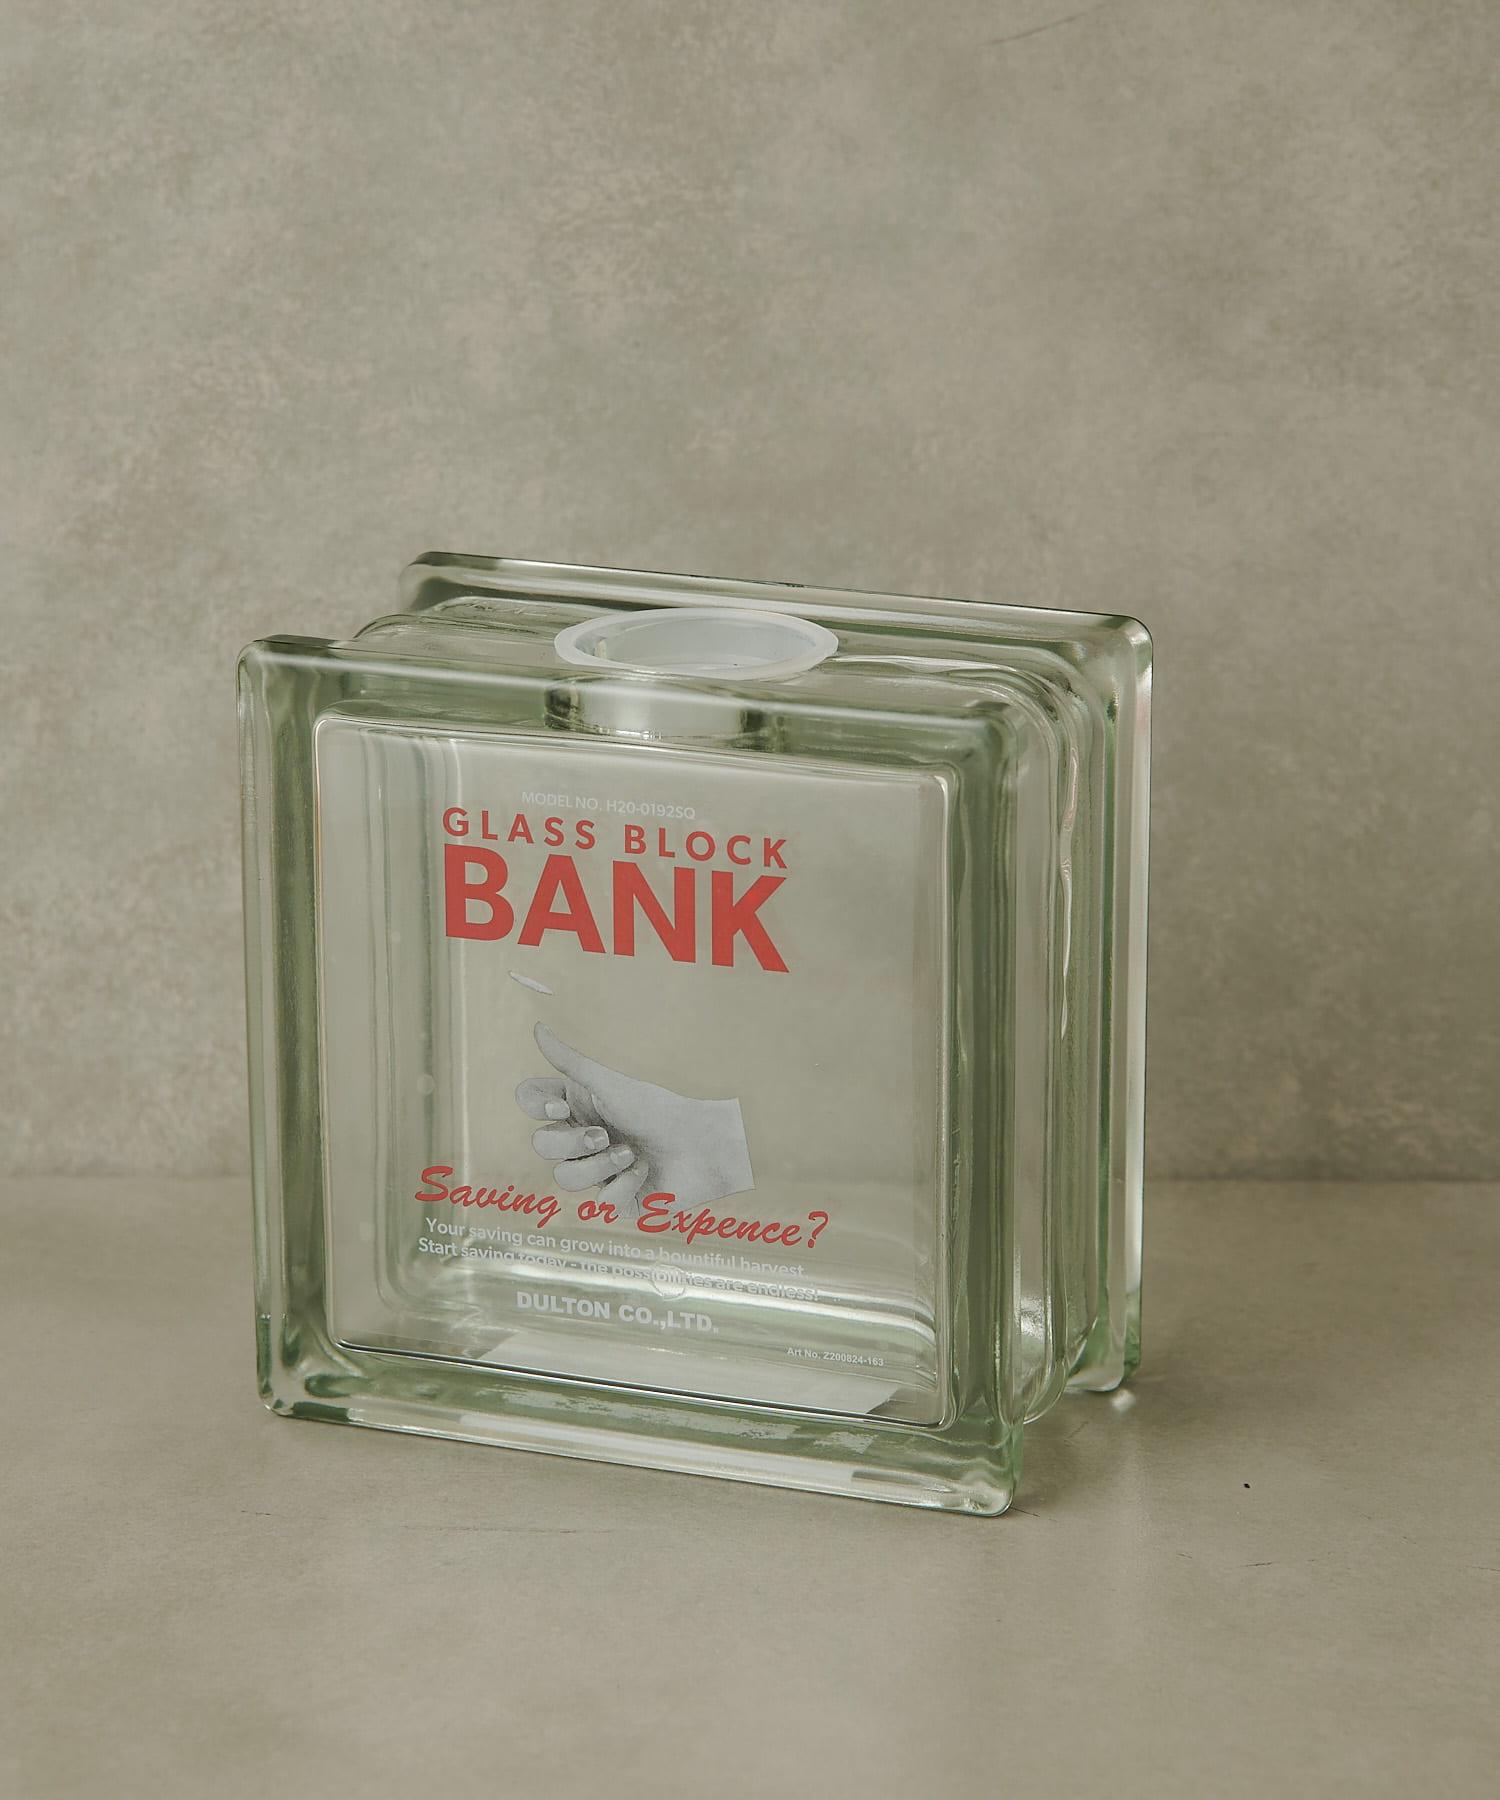 BIRTHDAY BAR(バースデイバー) 【DULTON ダルトン】GLASS BLOCK BANK SQUARE